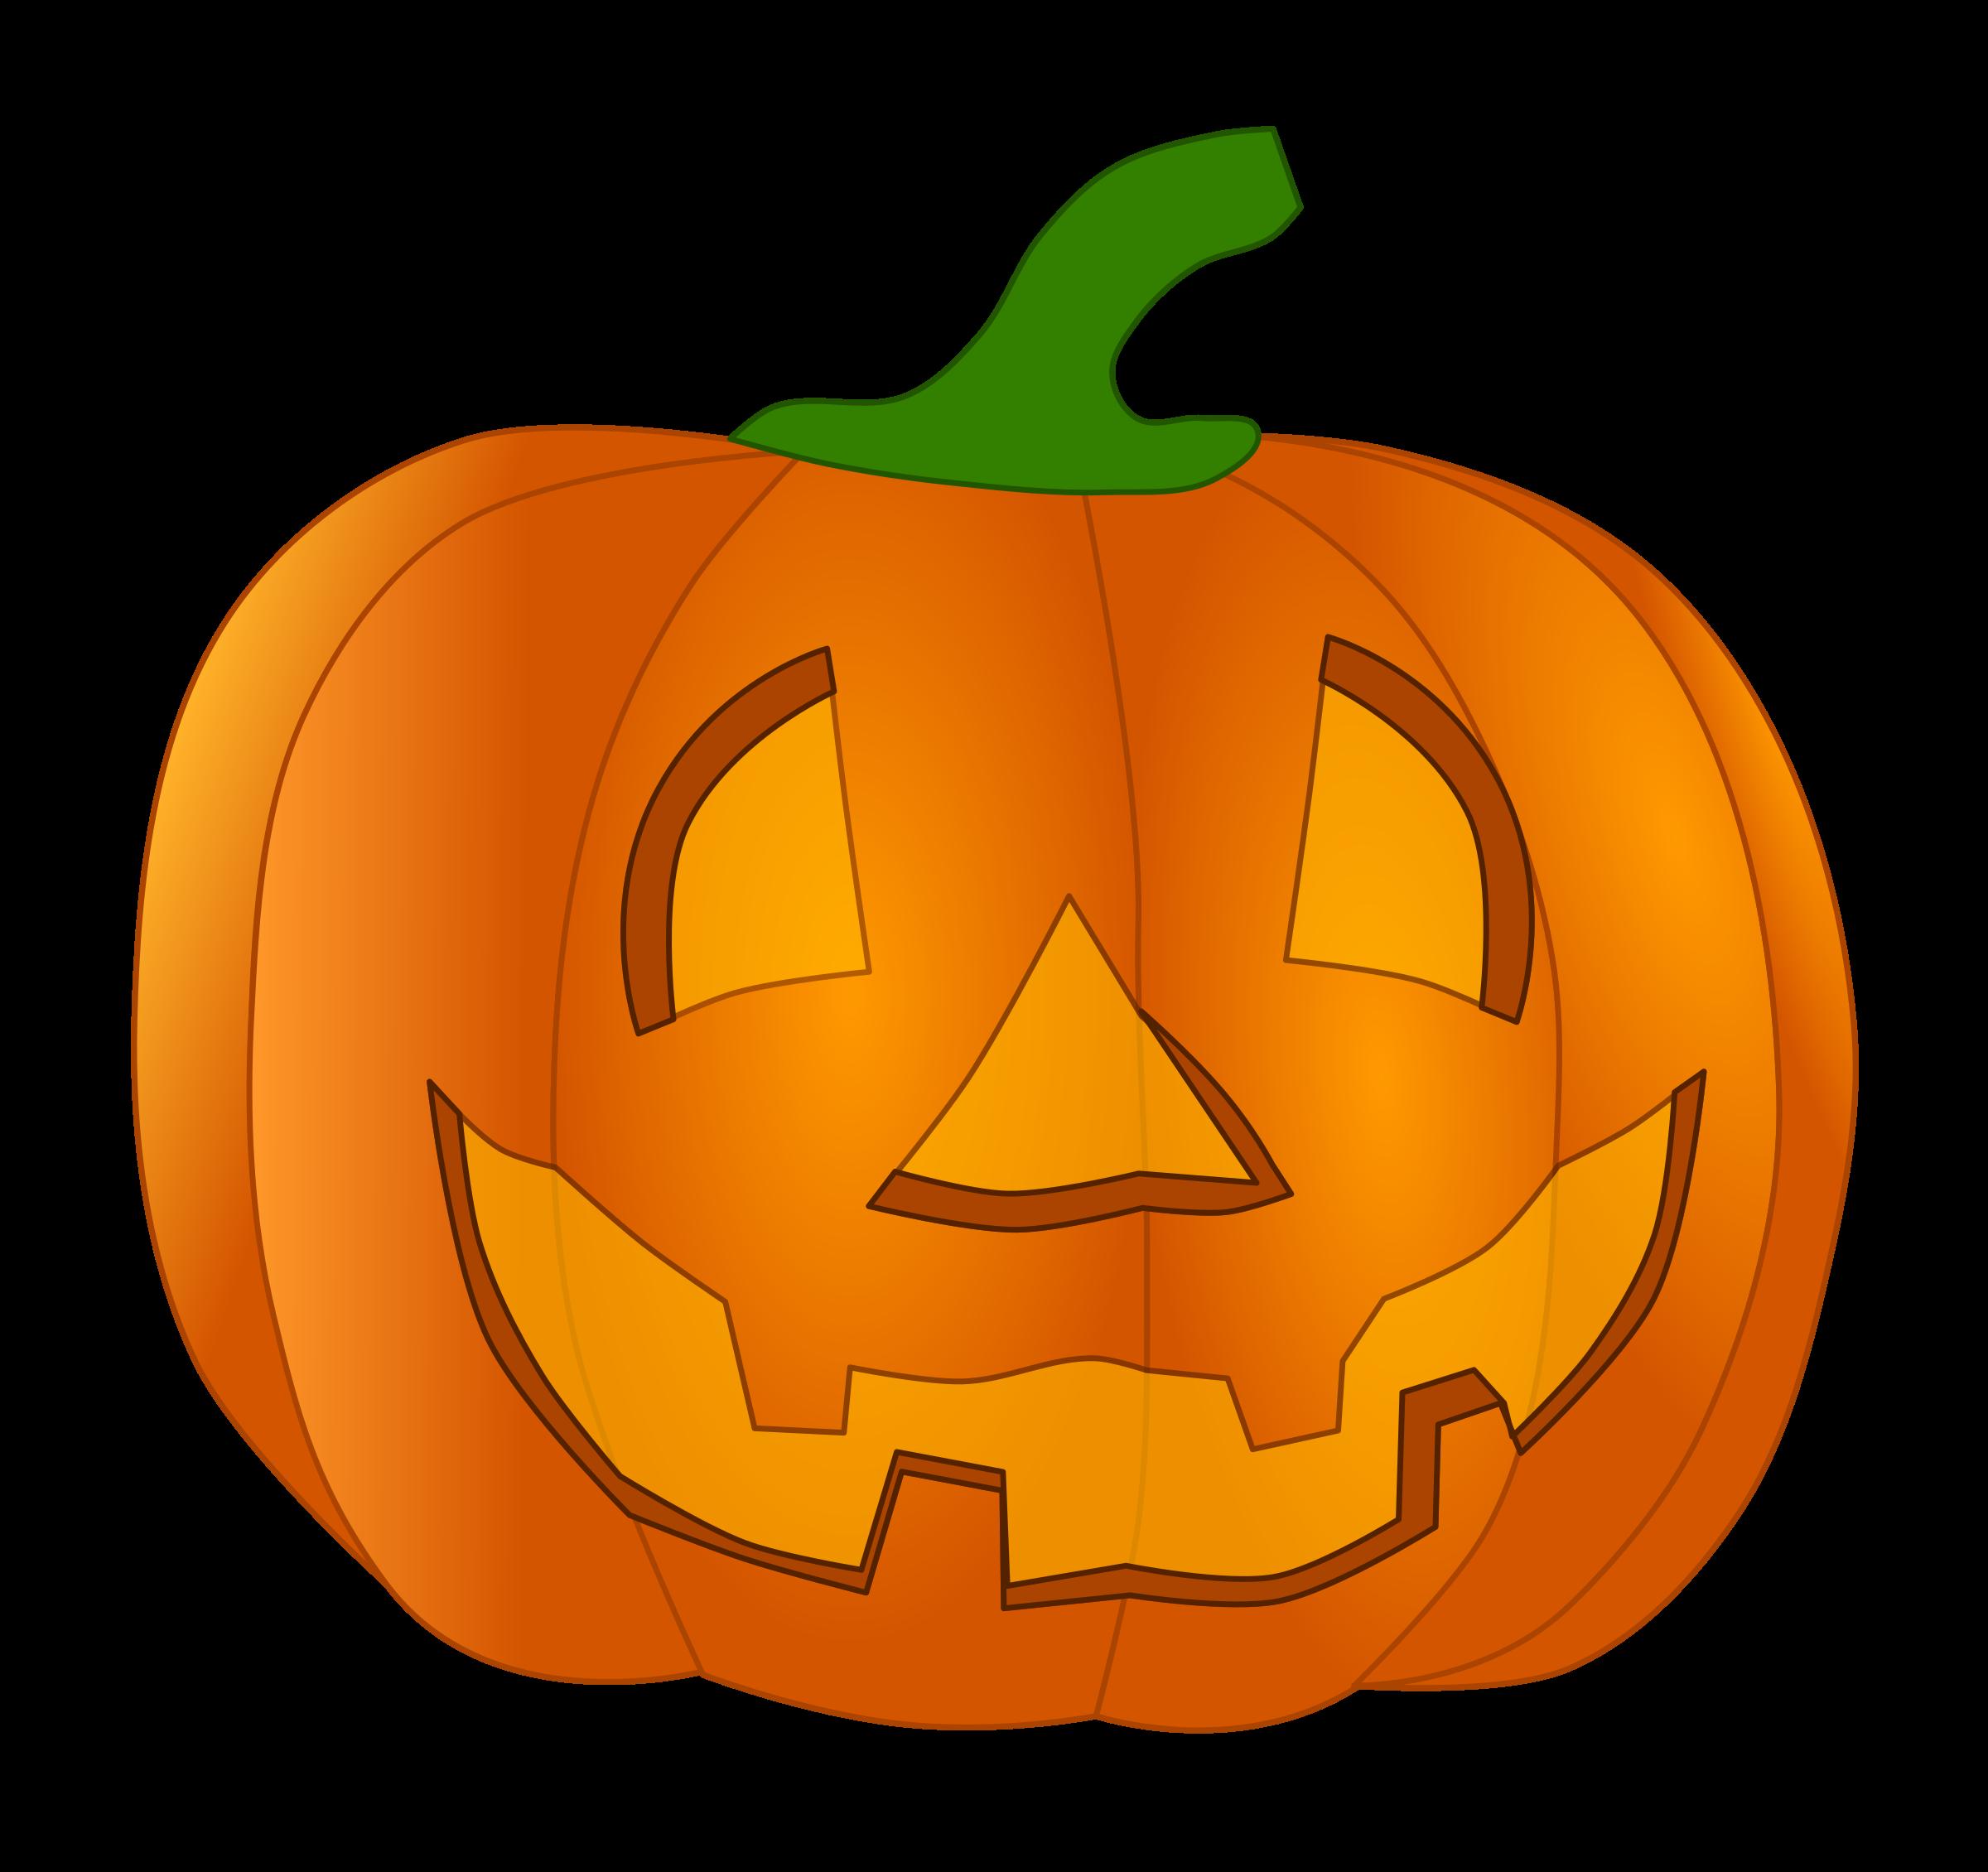 . Pumpkin clipart squash